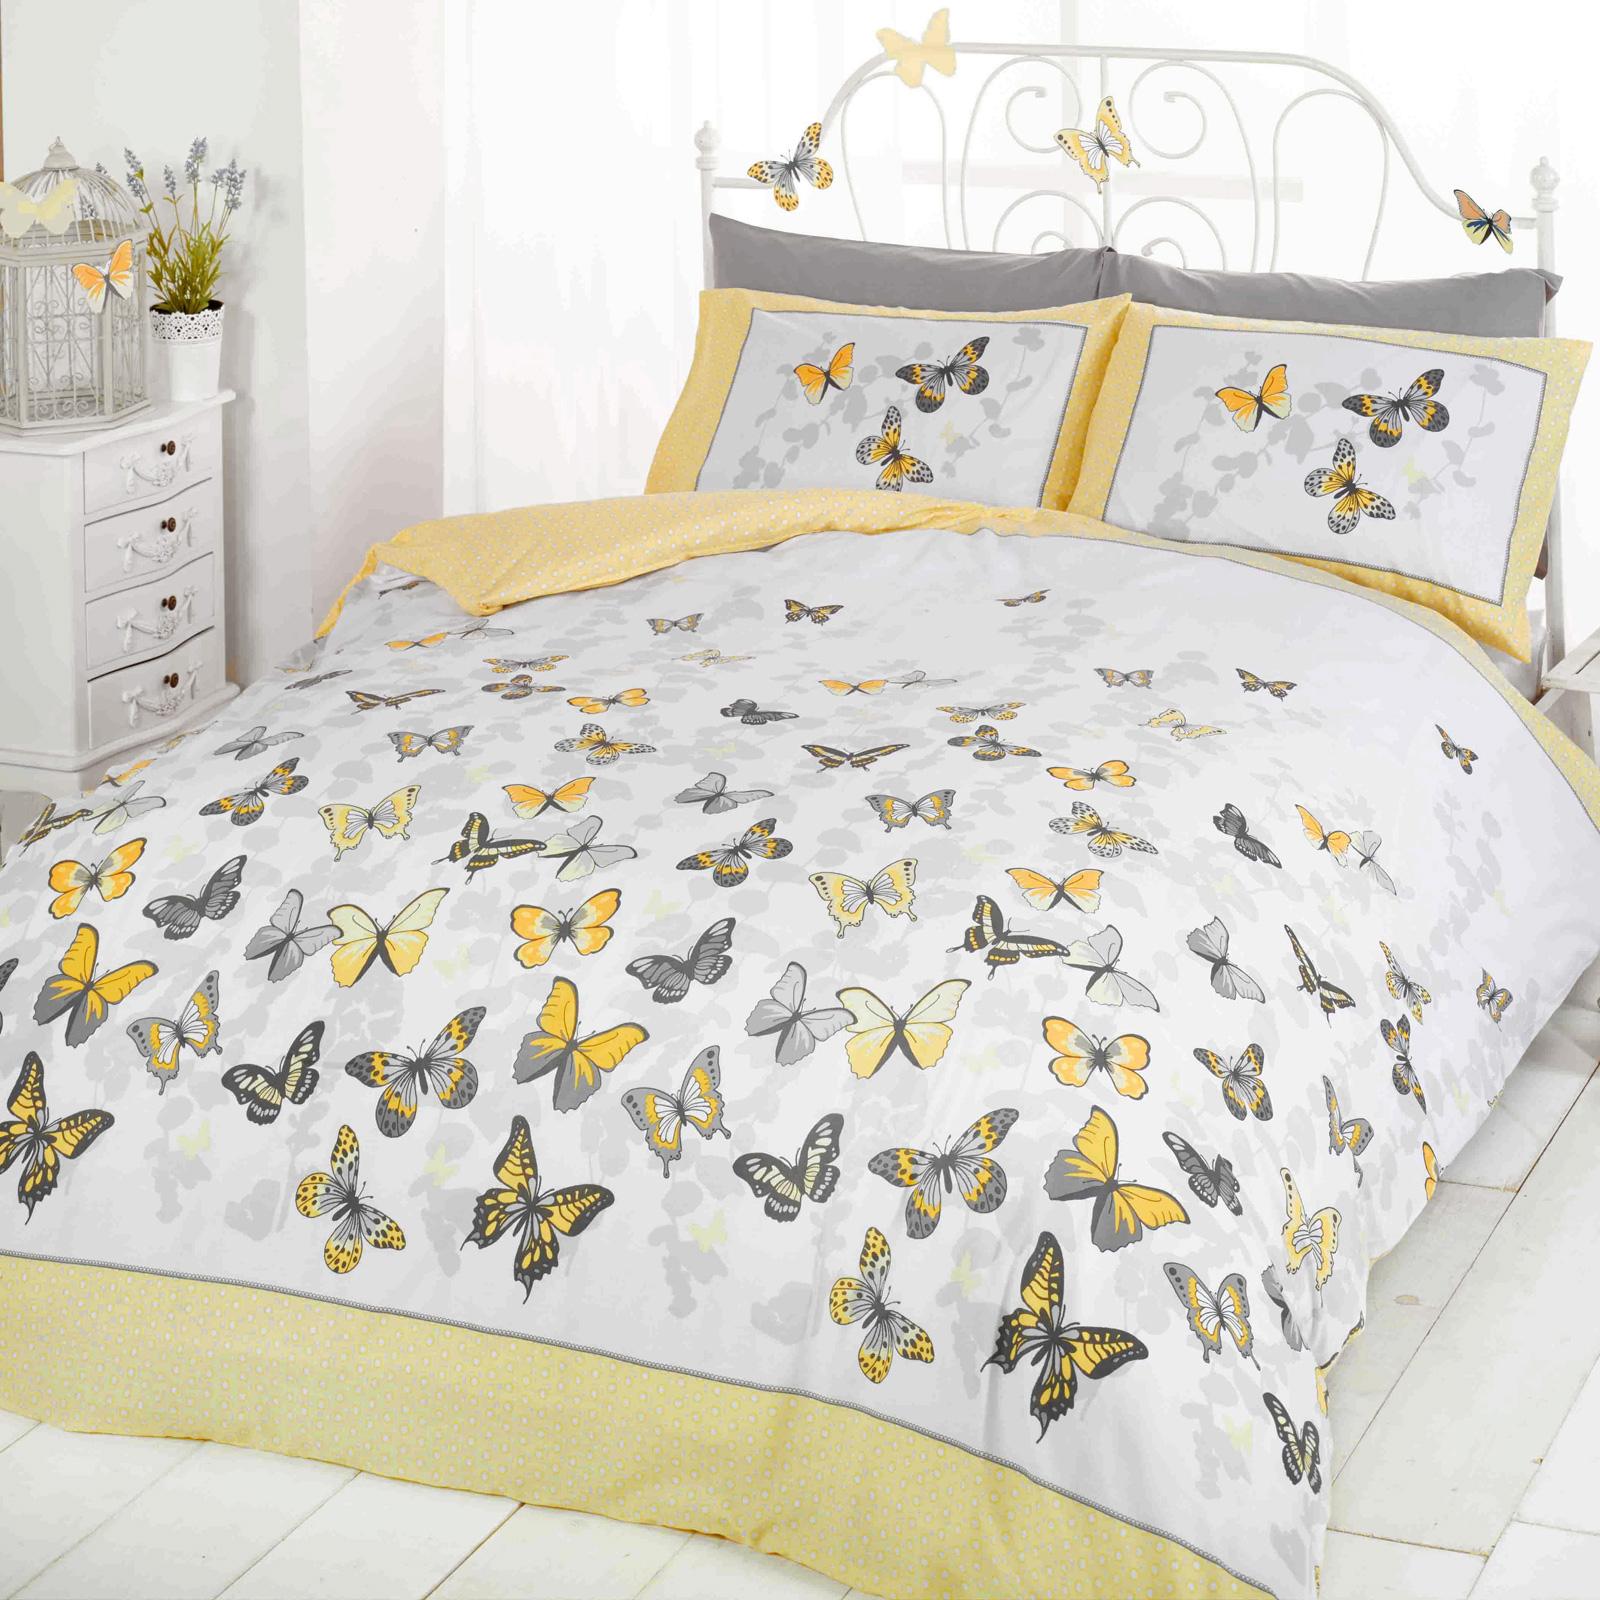 girls butterfly bedding reversible polka dot cotton rich duvet cover bed set ebay. Black Bedroom Furniture Sets. Home Design Ideas